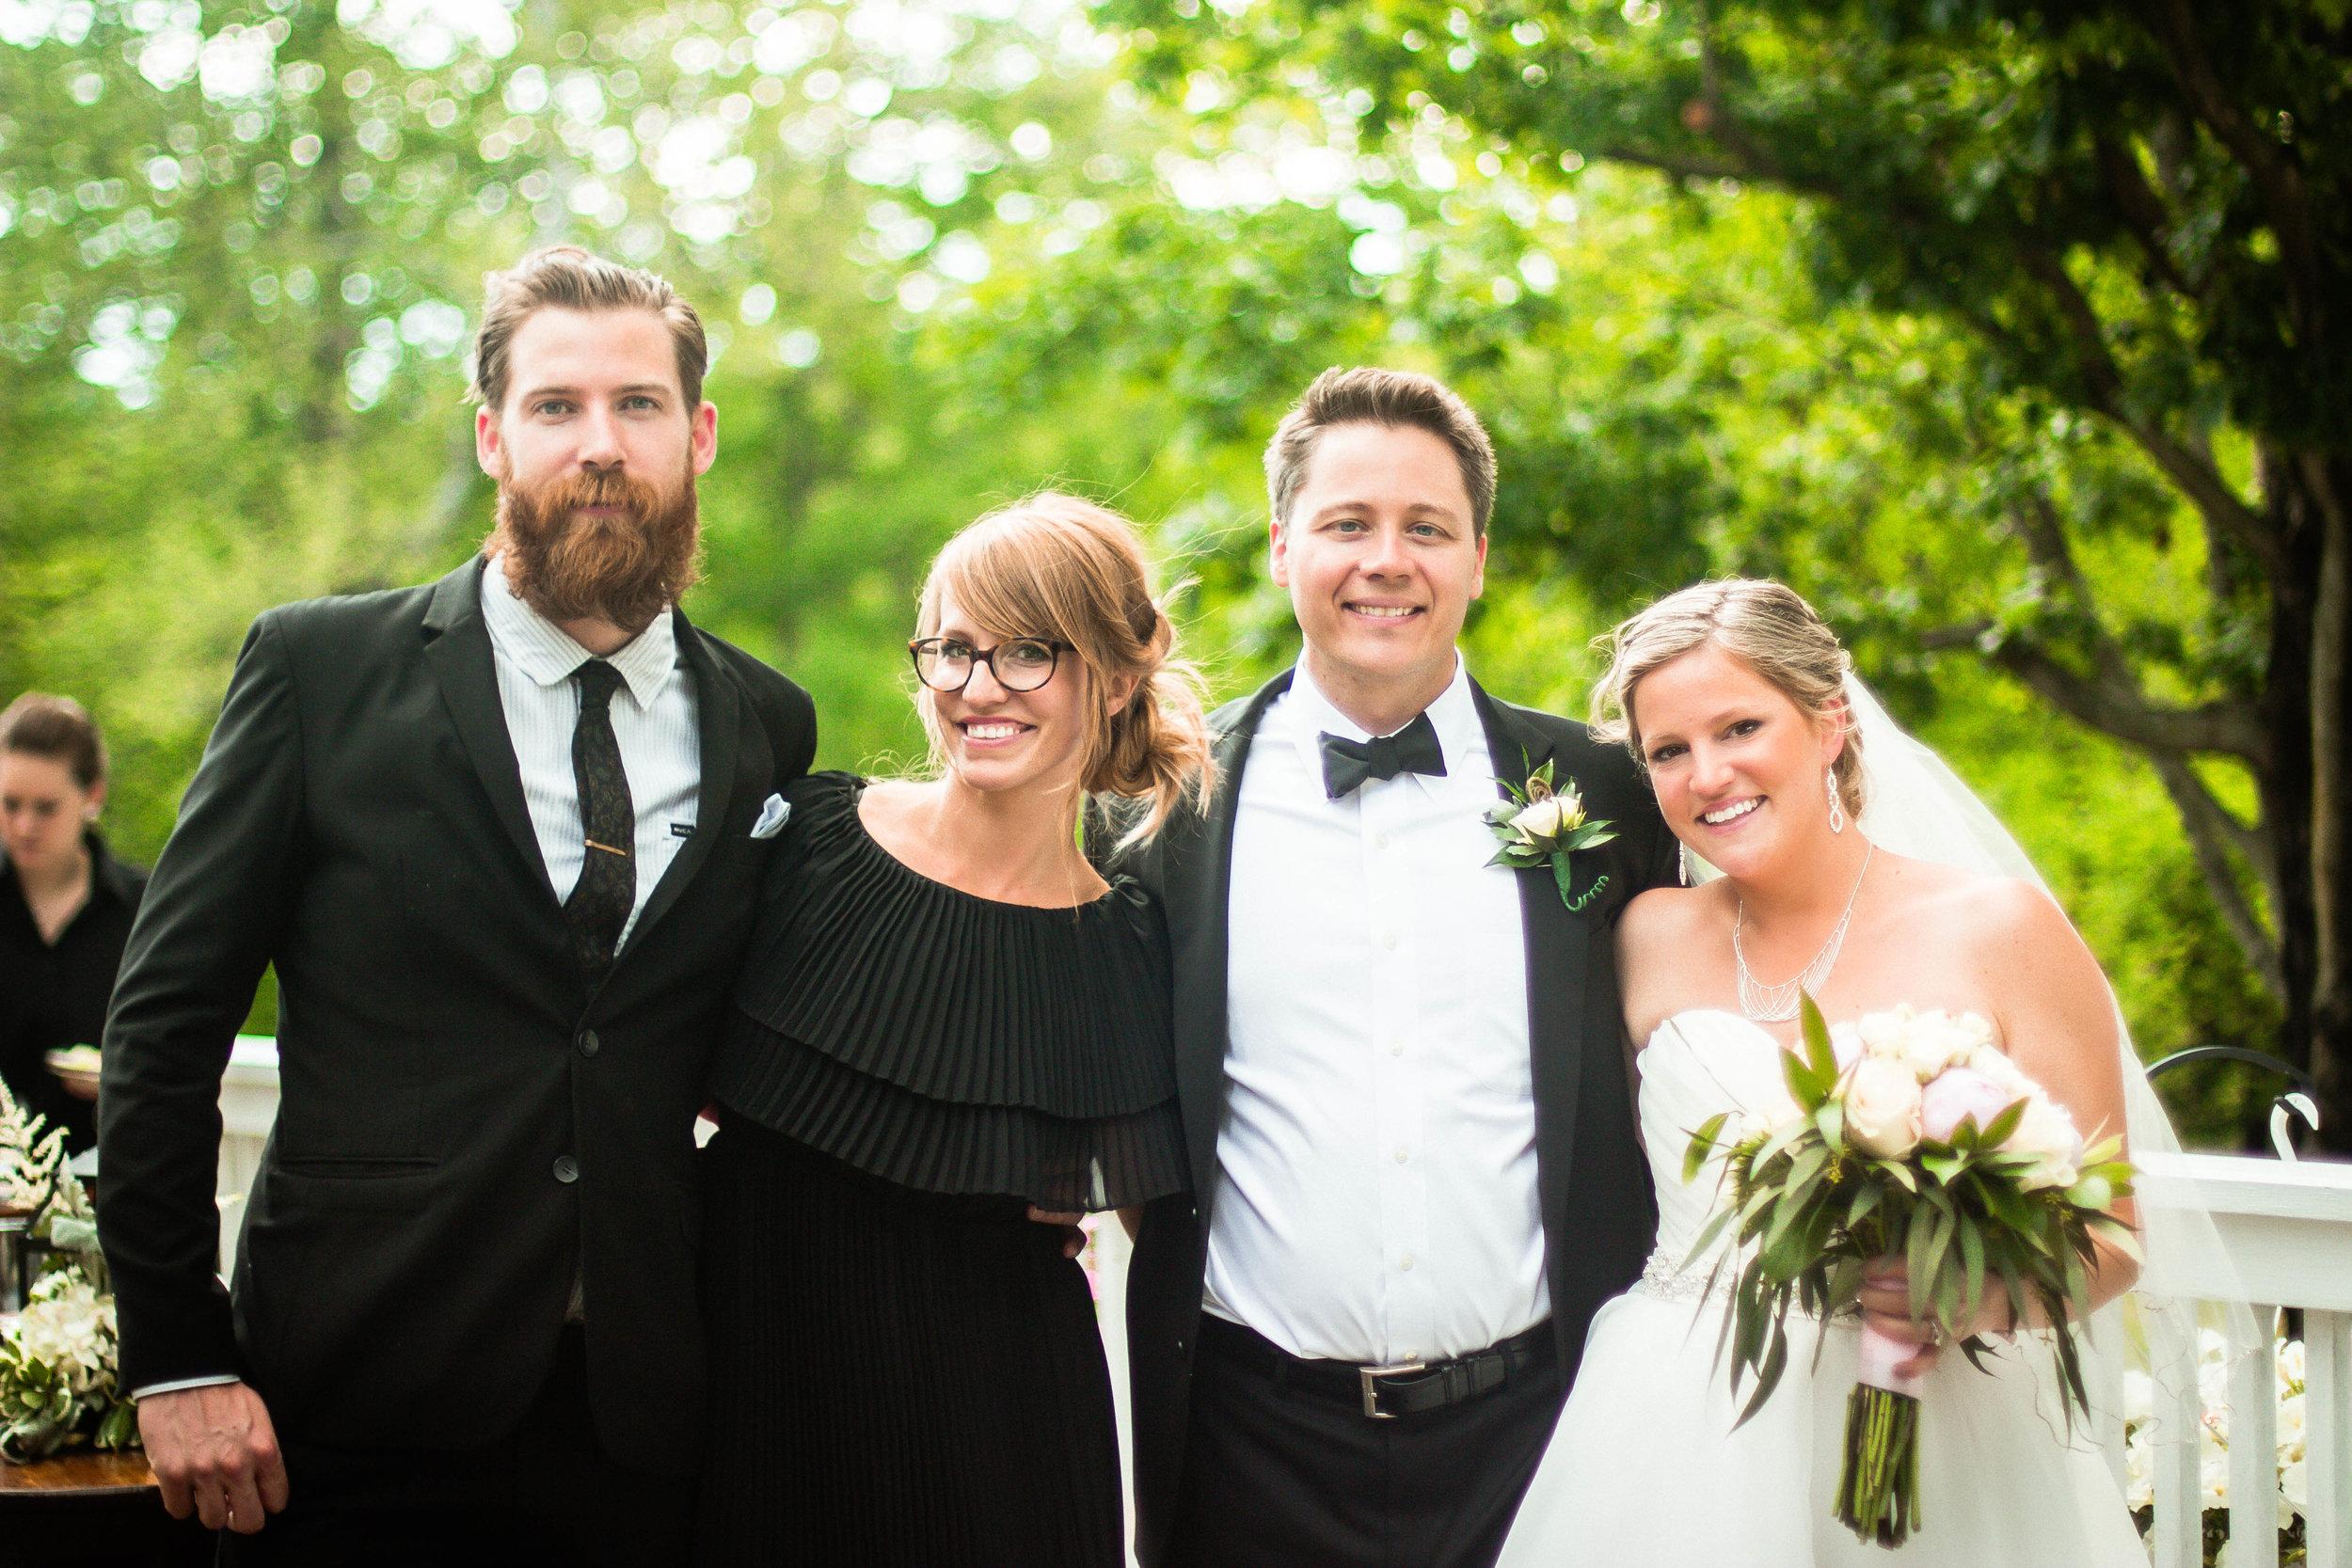 WeddingPortfolio-10.jpg